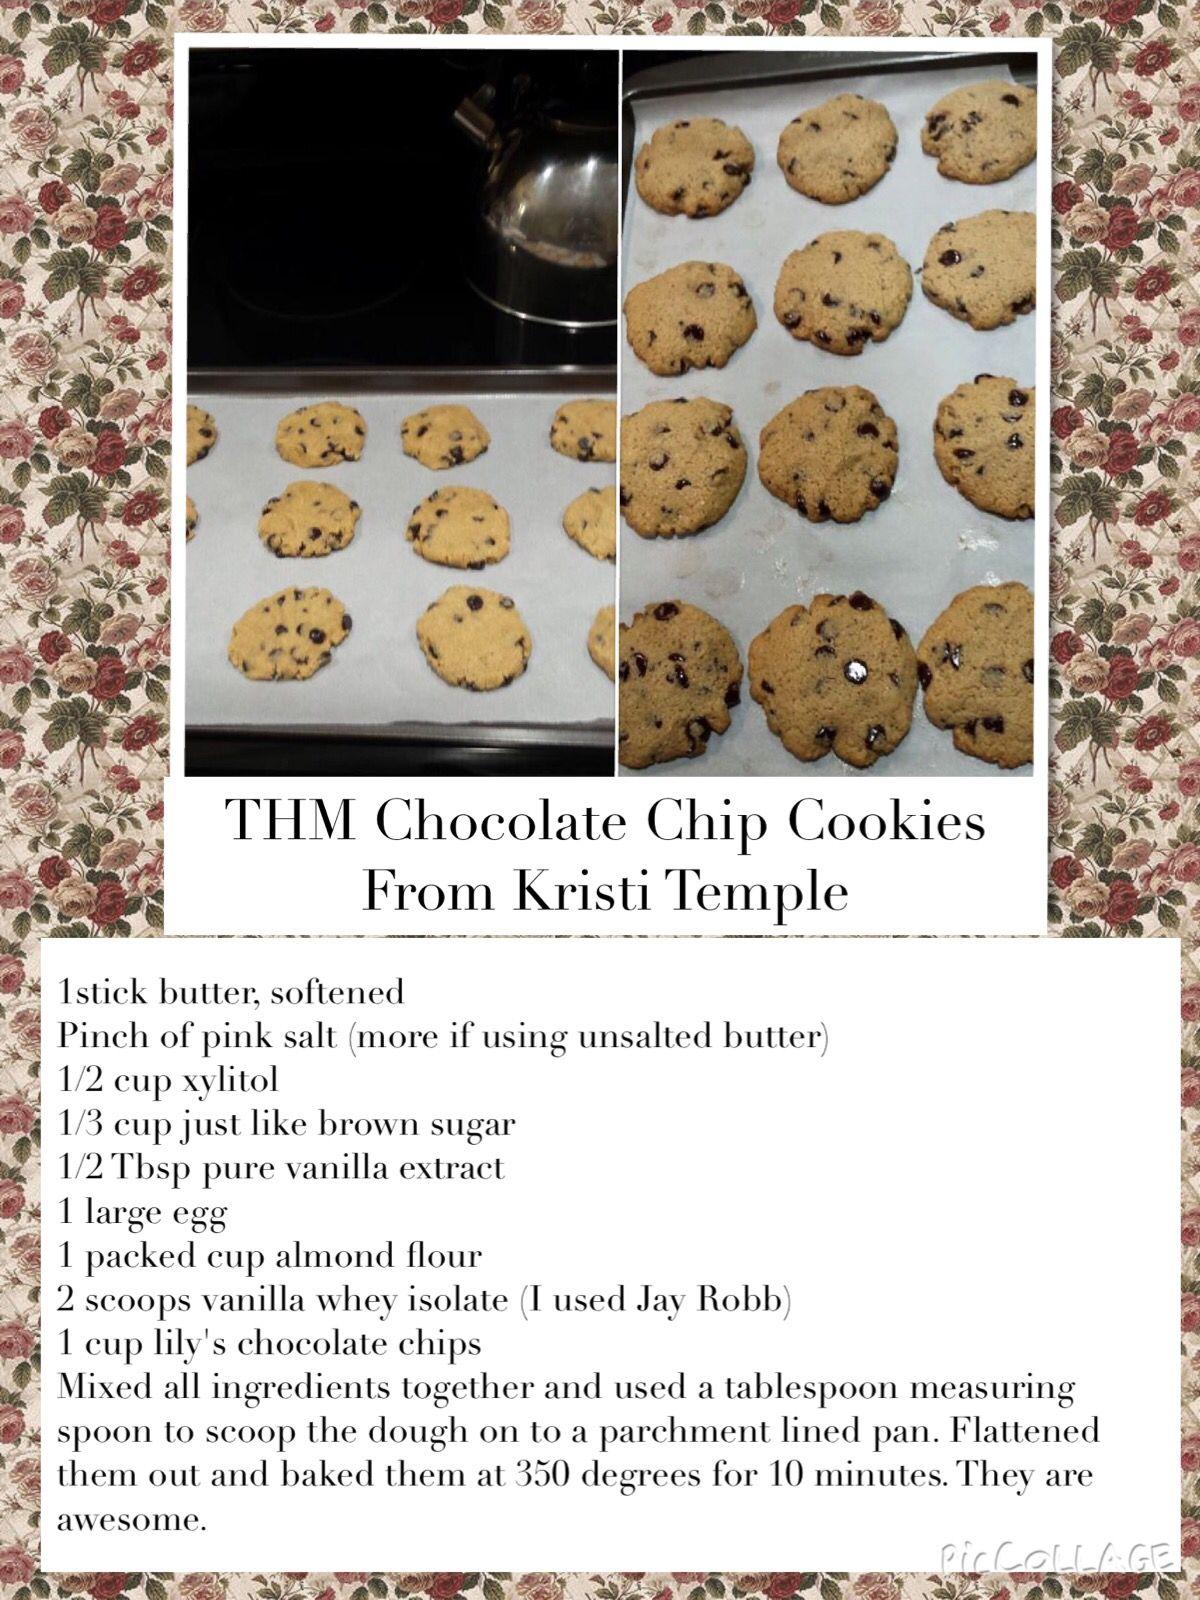 THM Chocolate Chip Cookies